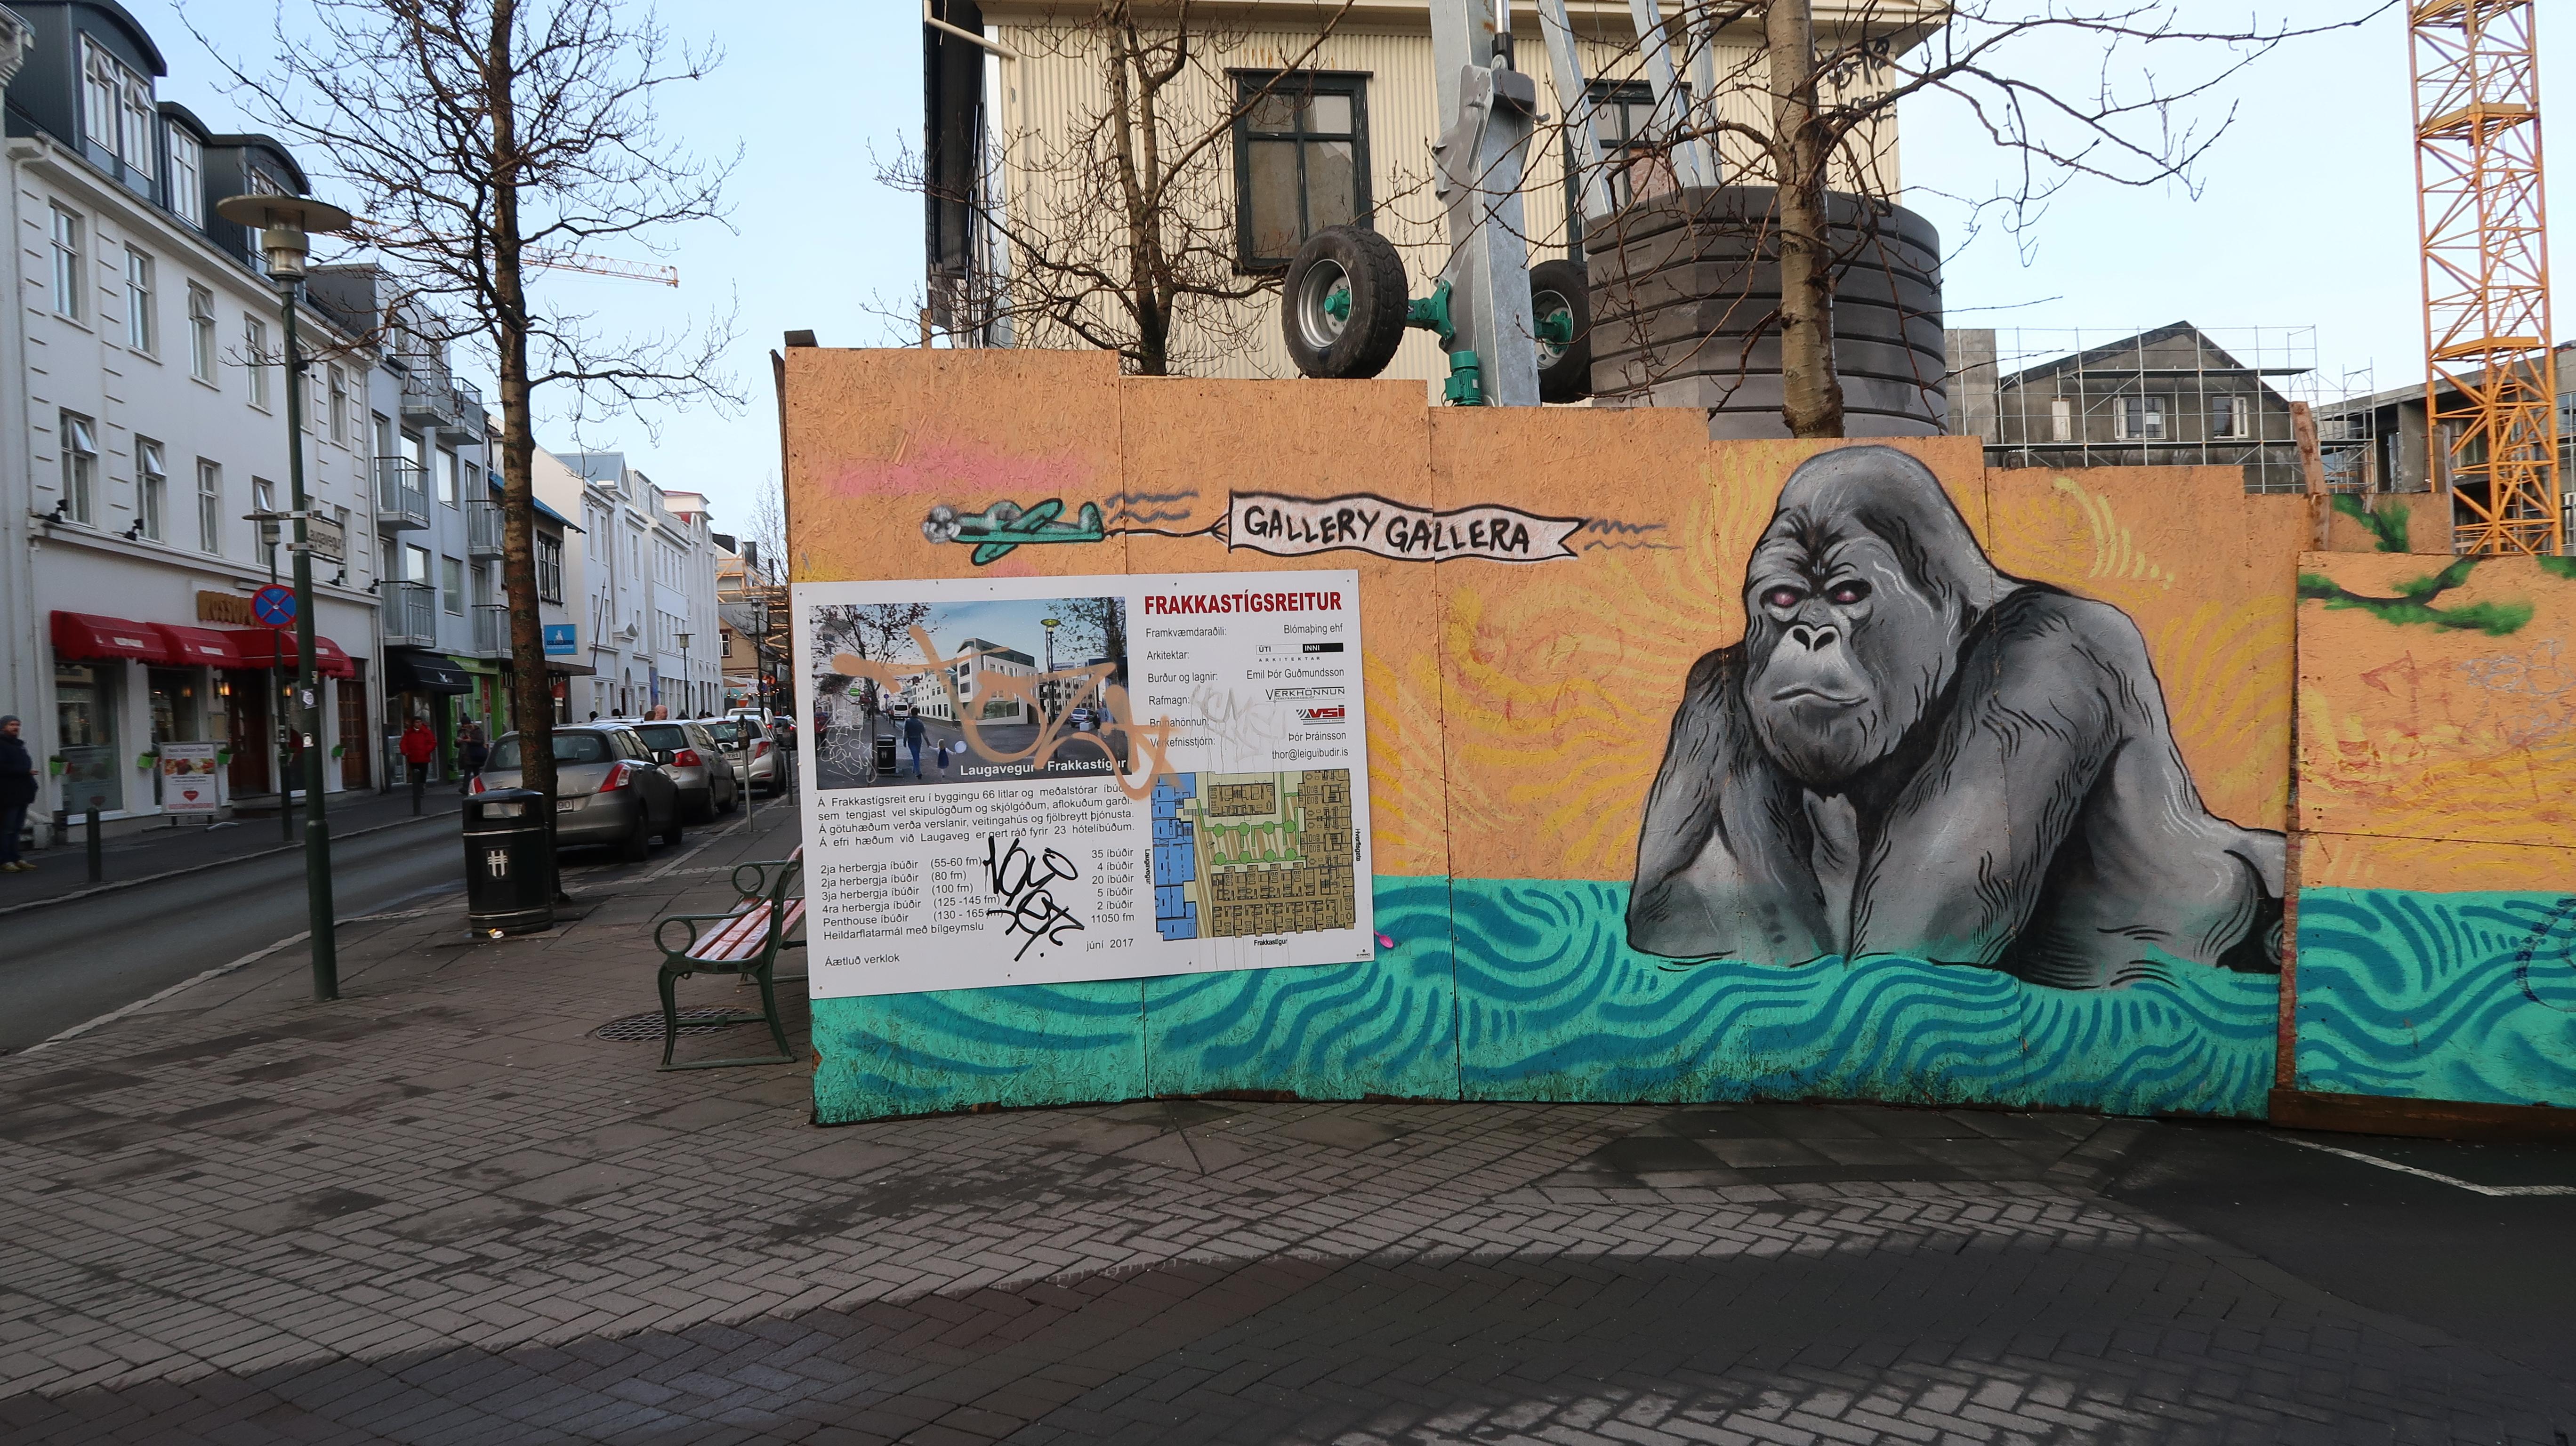 Gorilla street art in reykjavik